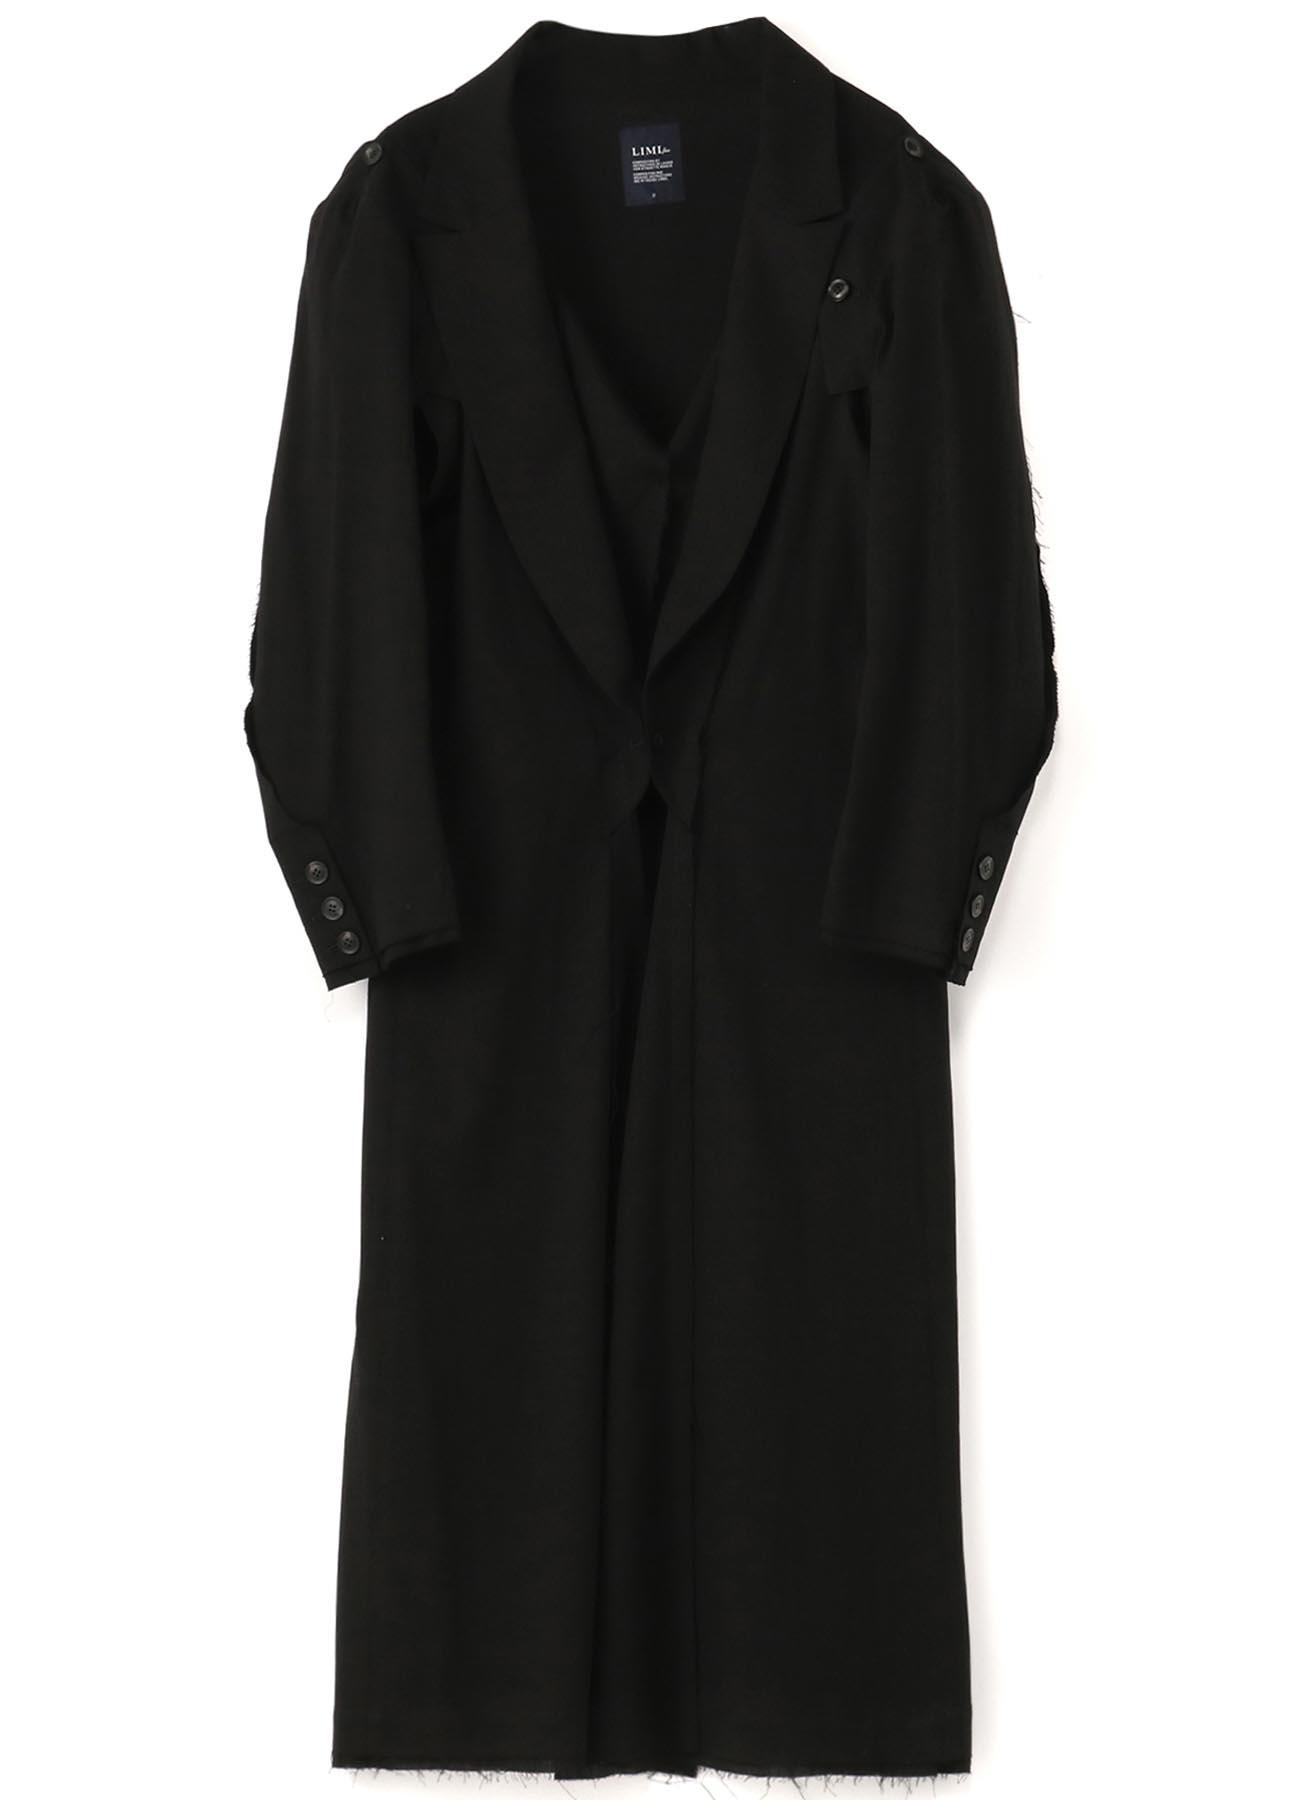 C/Li Calico A Button Sleeve Coat